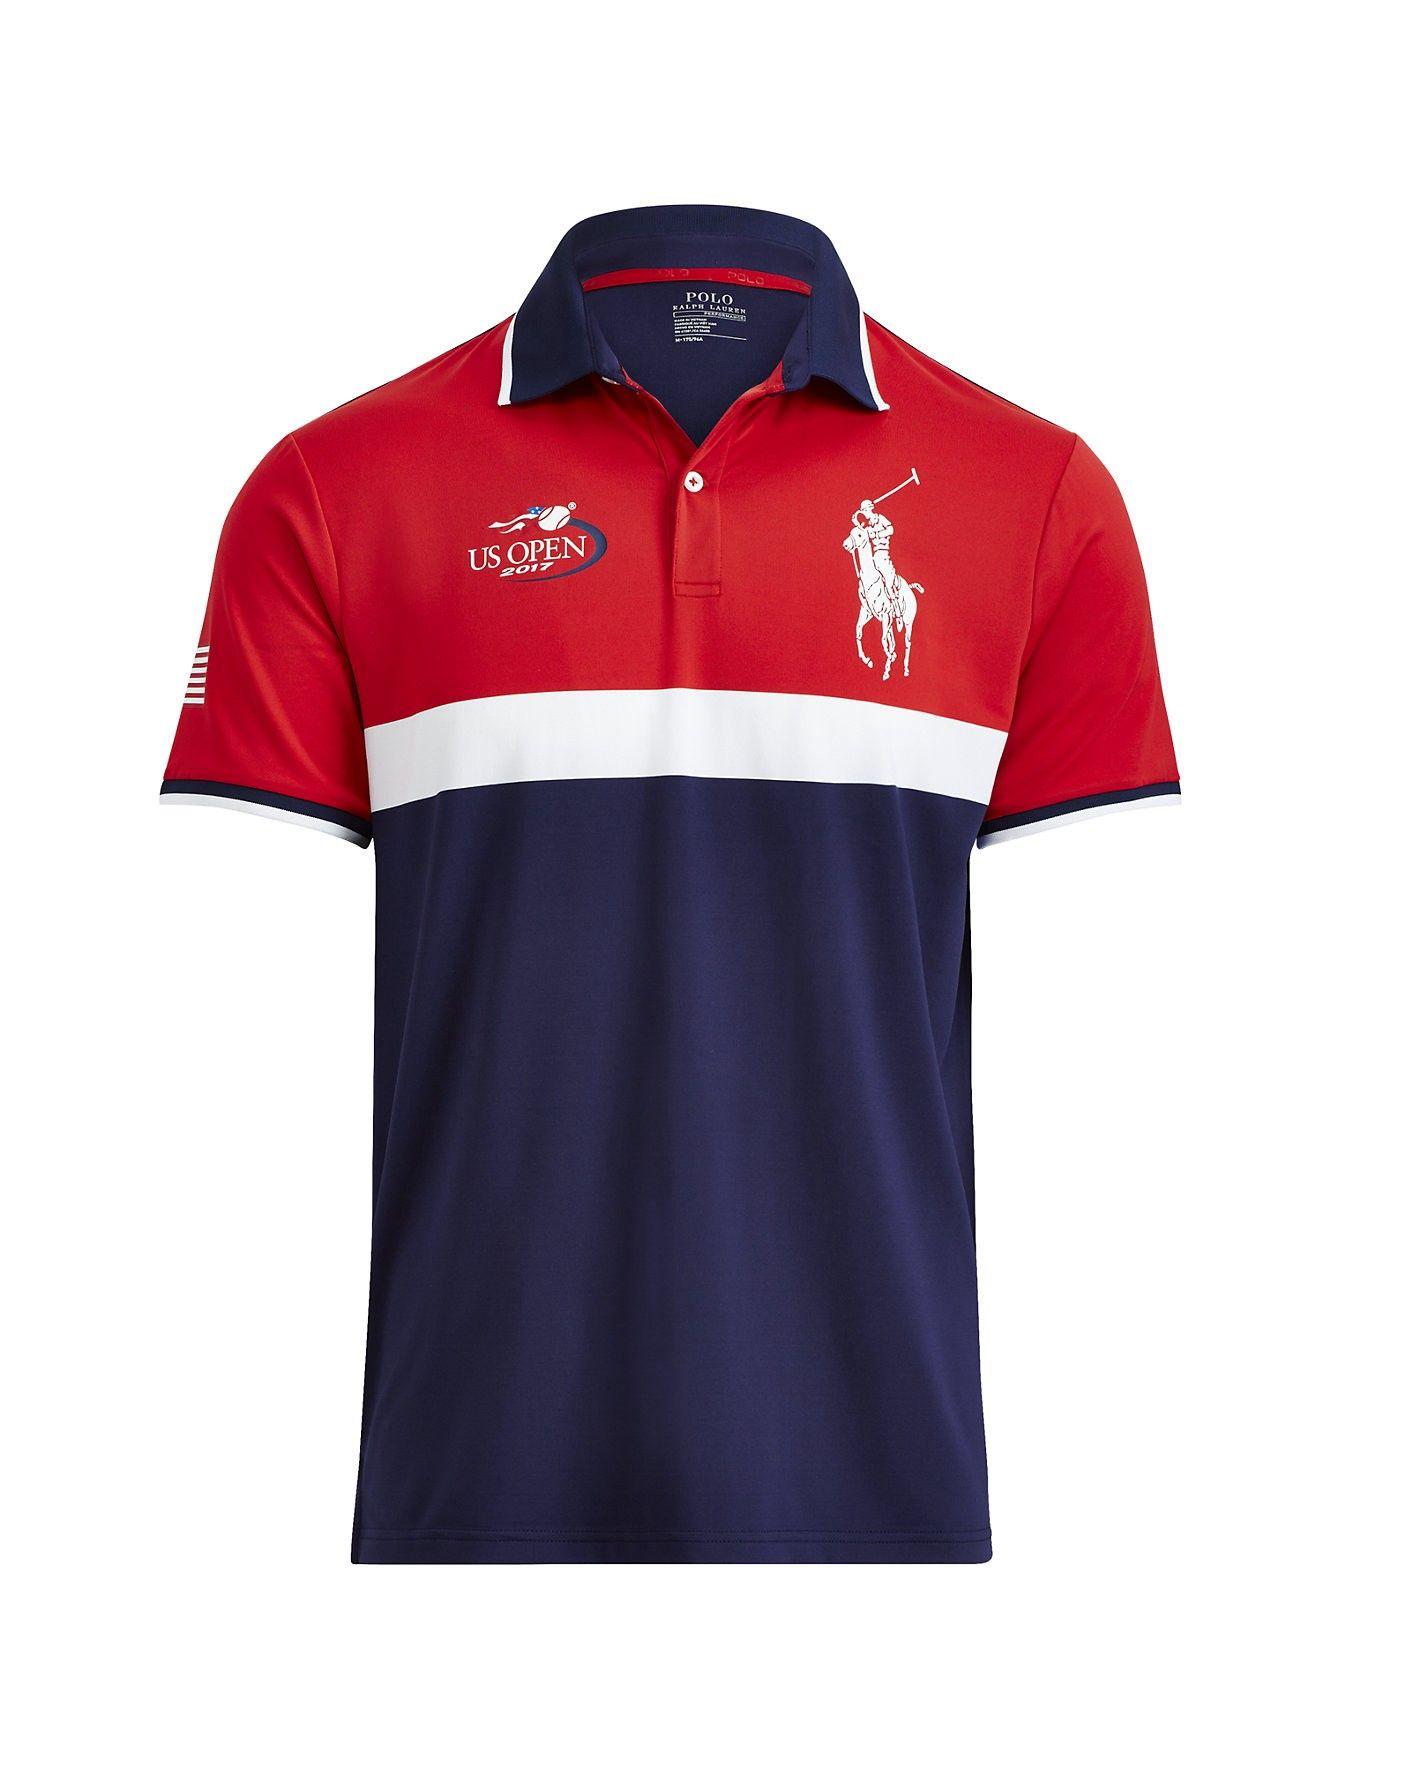 outlet on sale 100% high quality official site RALPH LAUREN Polo Ralph Lauren US Open Ball Boy Polo Shirt ...